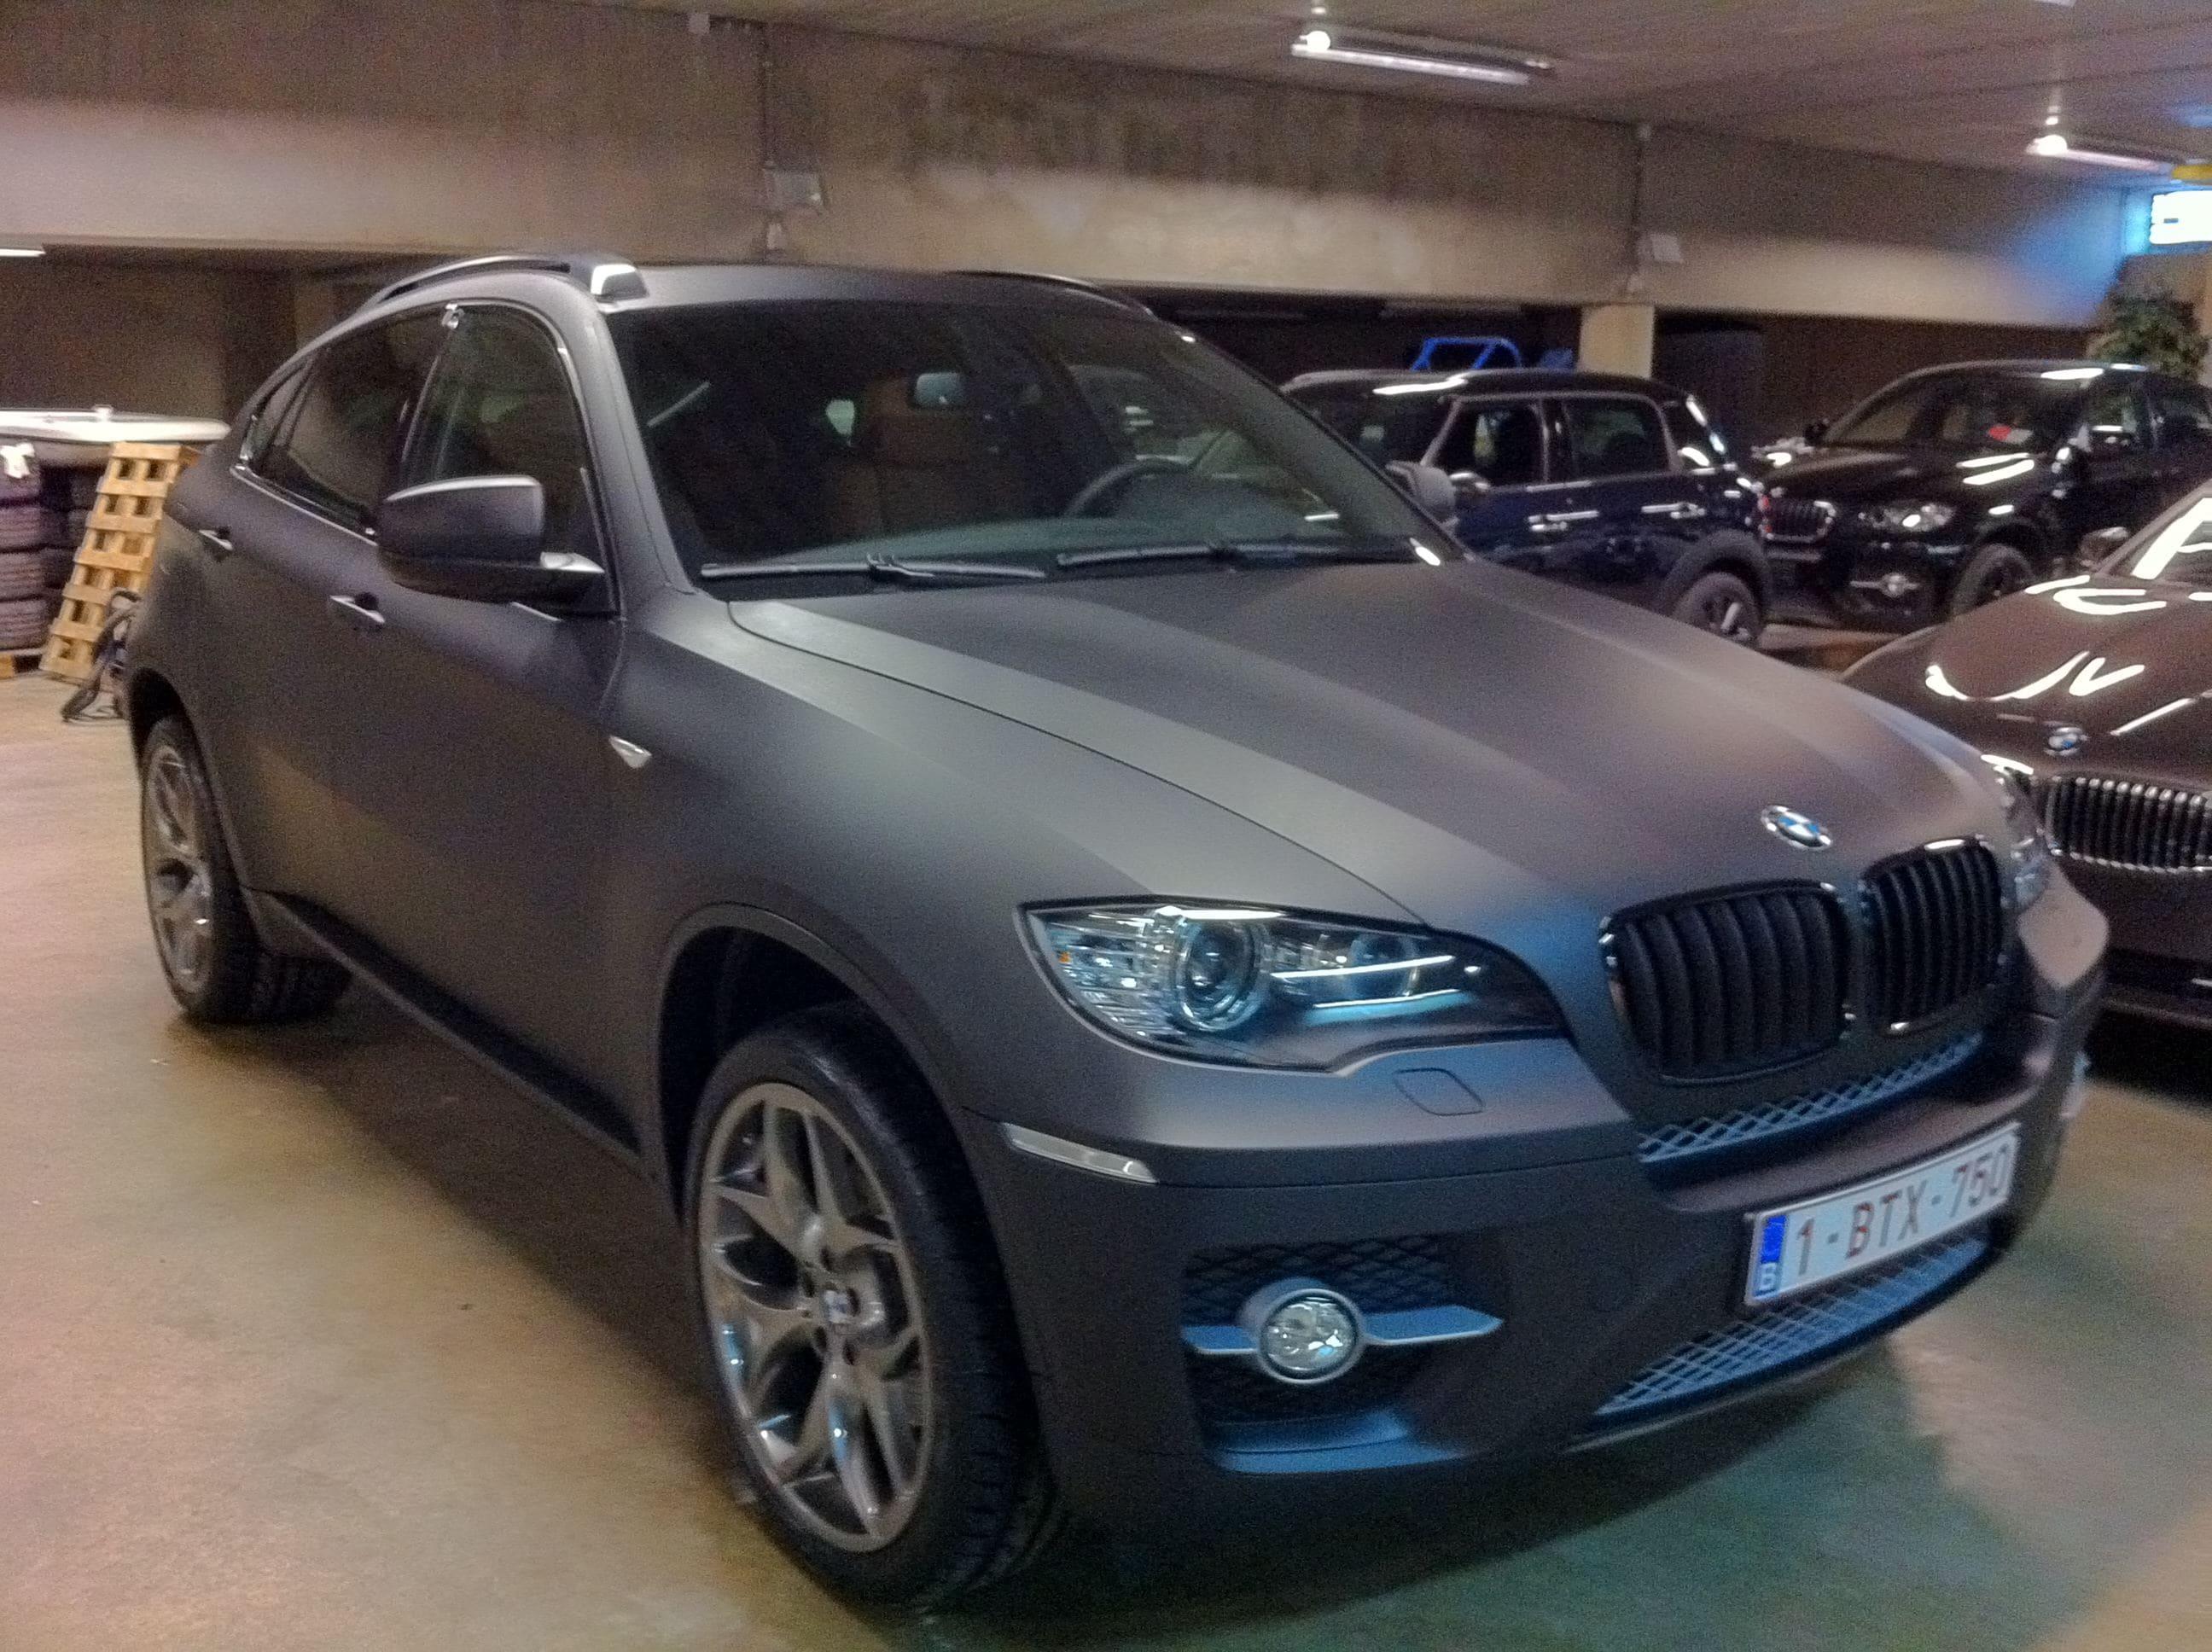 BMW X6 met Mat Zwarte Wrap, Carwrapping door Wrapmyride.nu Foto-nr:5489, ©2020